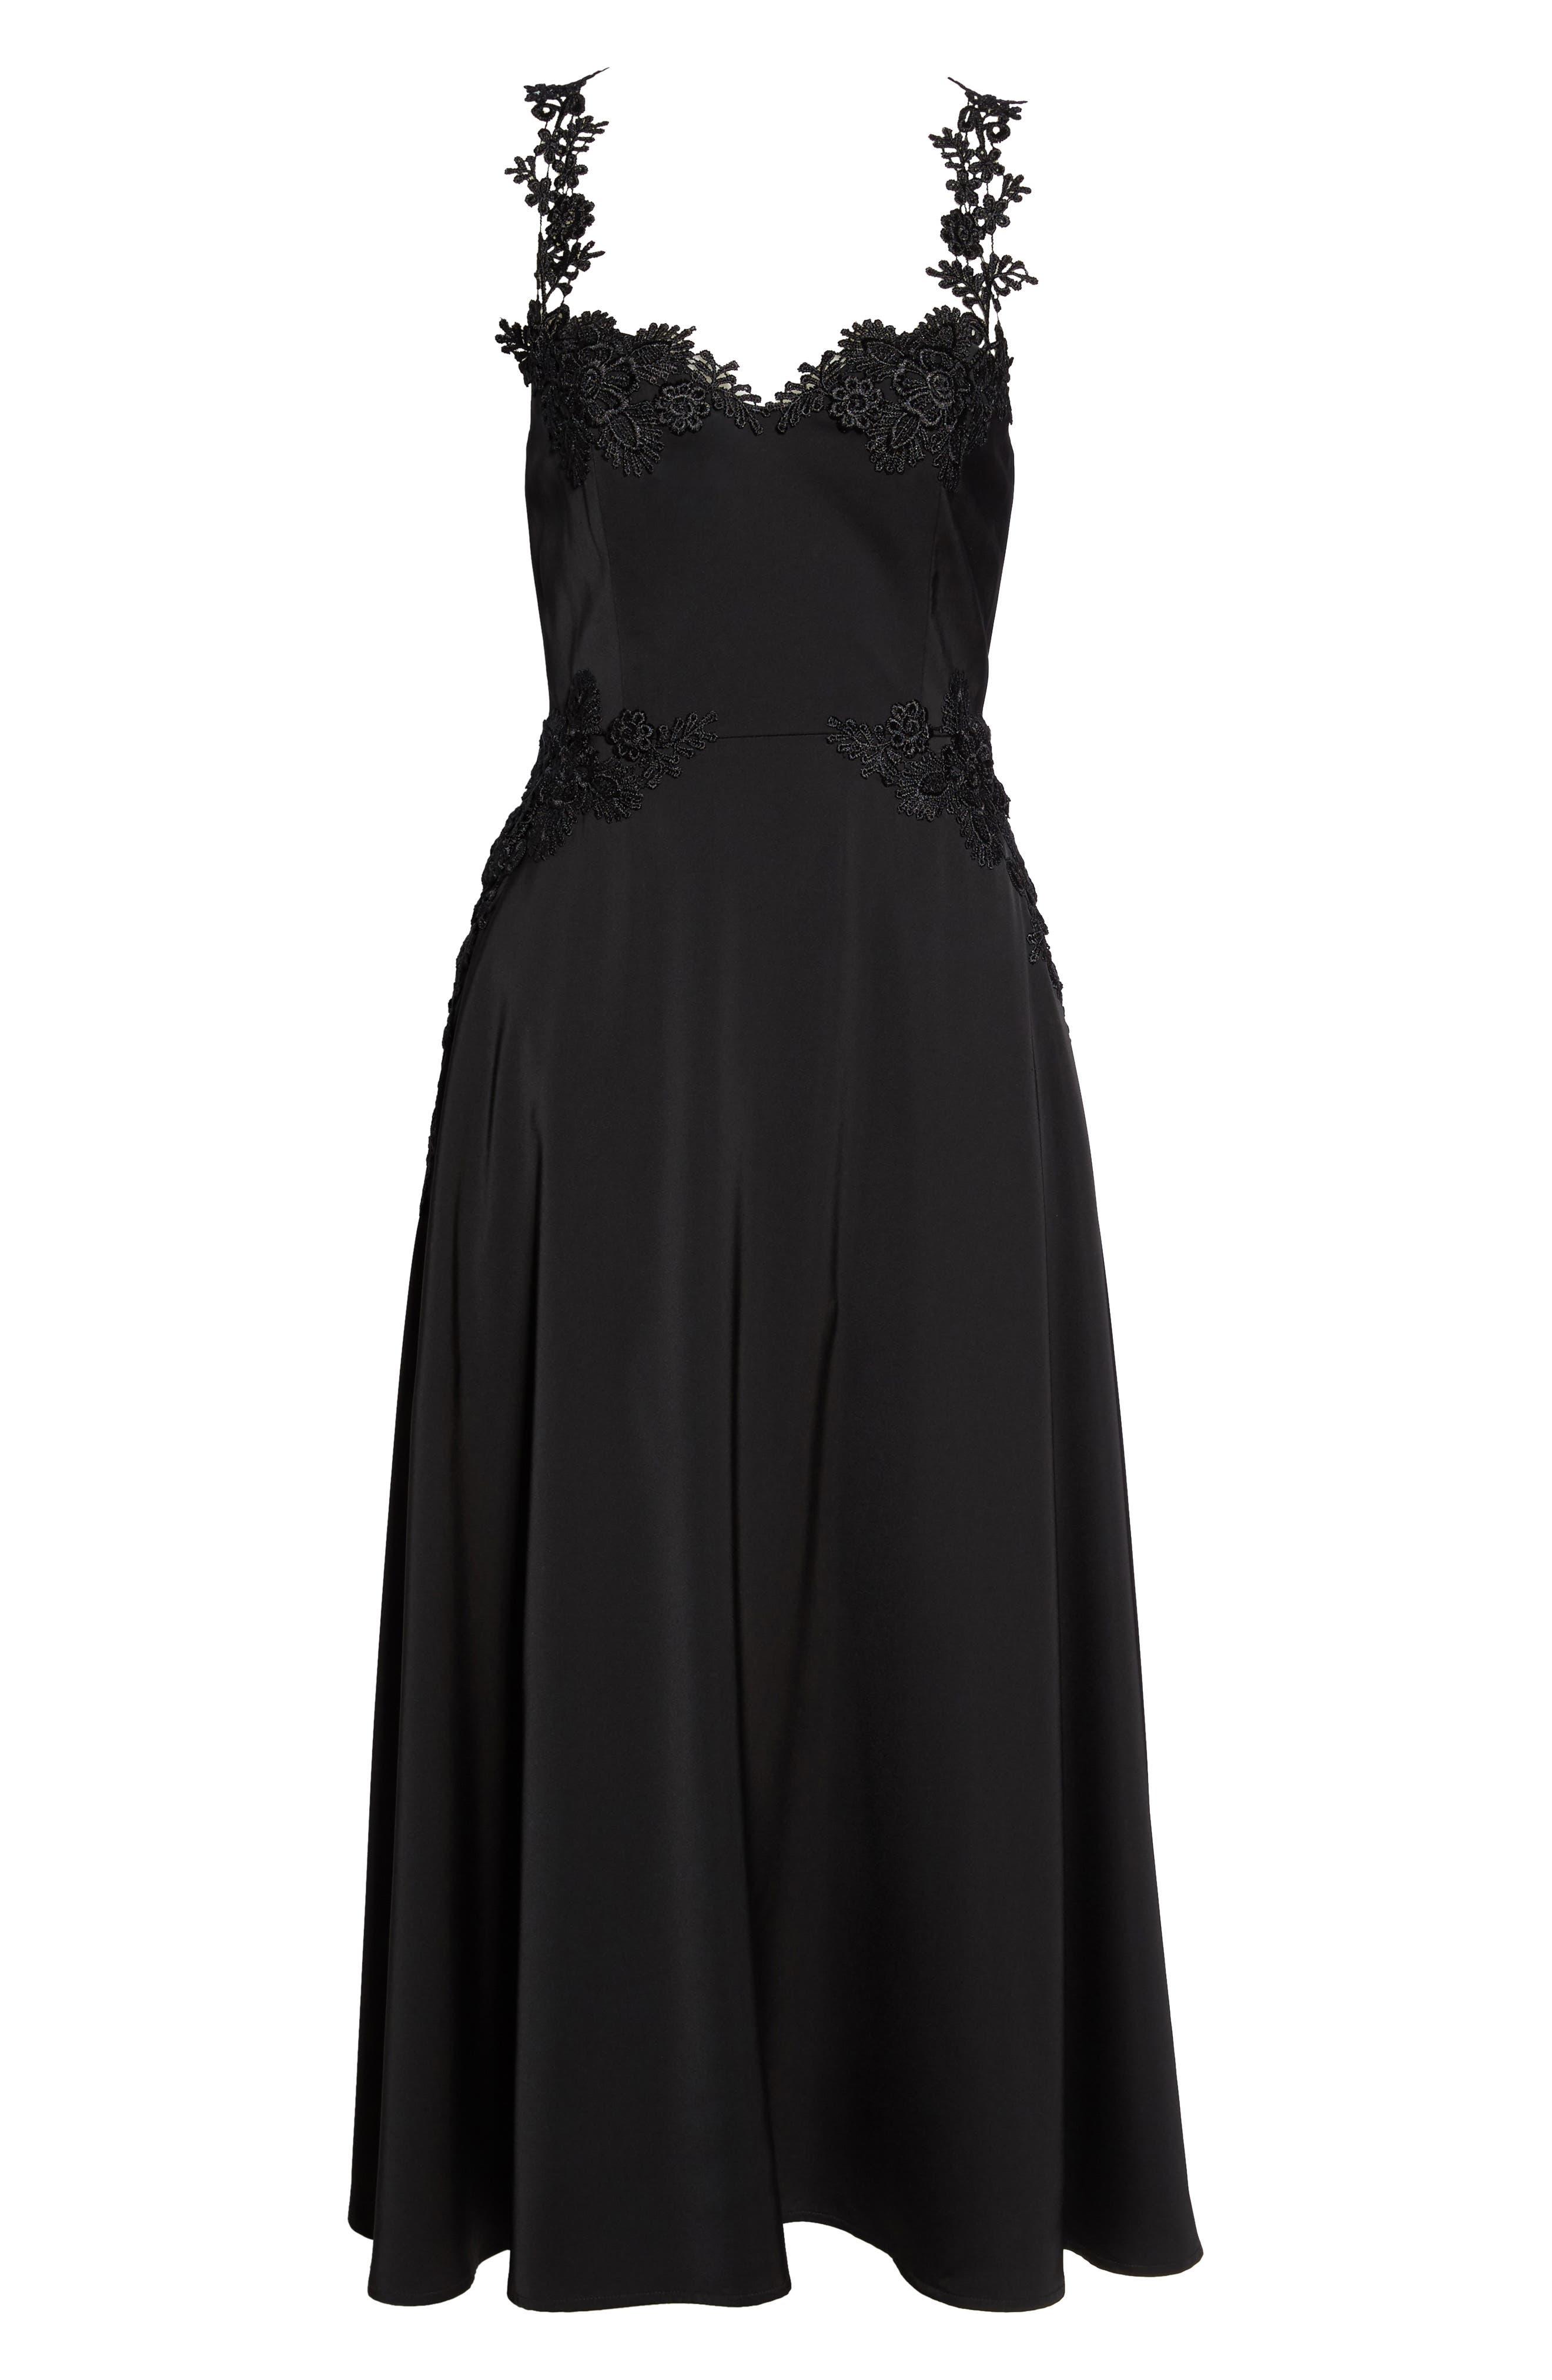 Aislinn Floral Appliqué Tea Length Dress,                             Alternate thumbnail 6, color,                             Black Multi